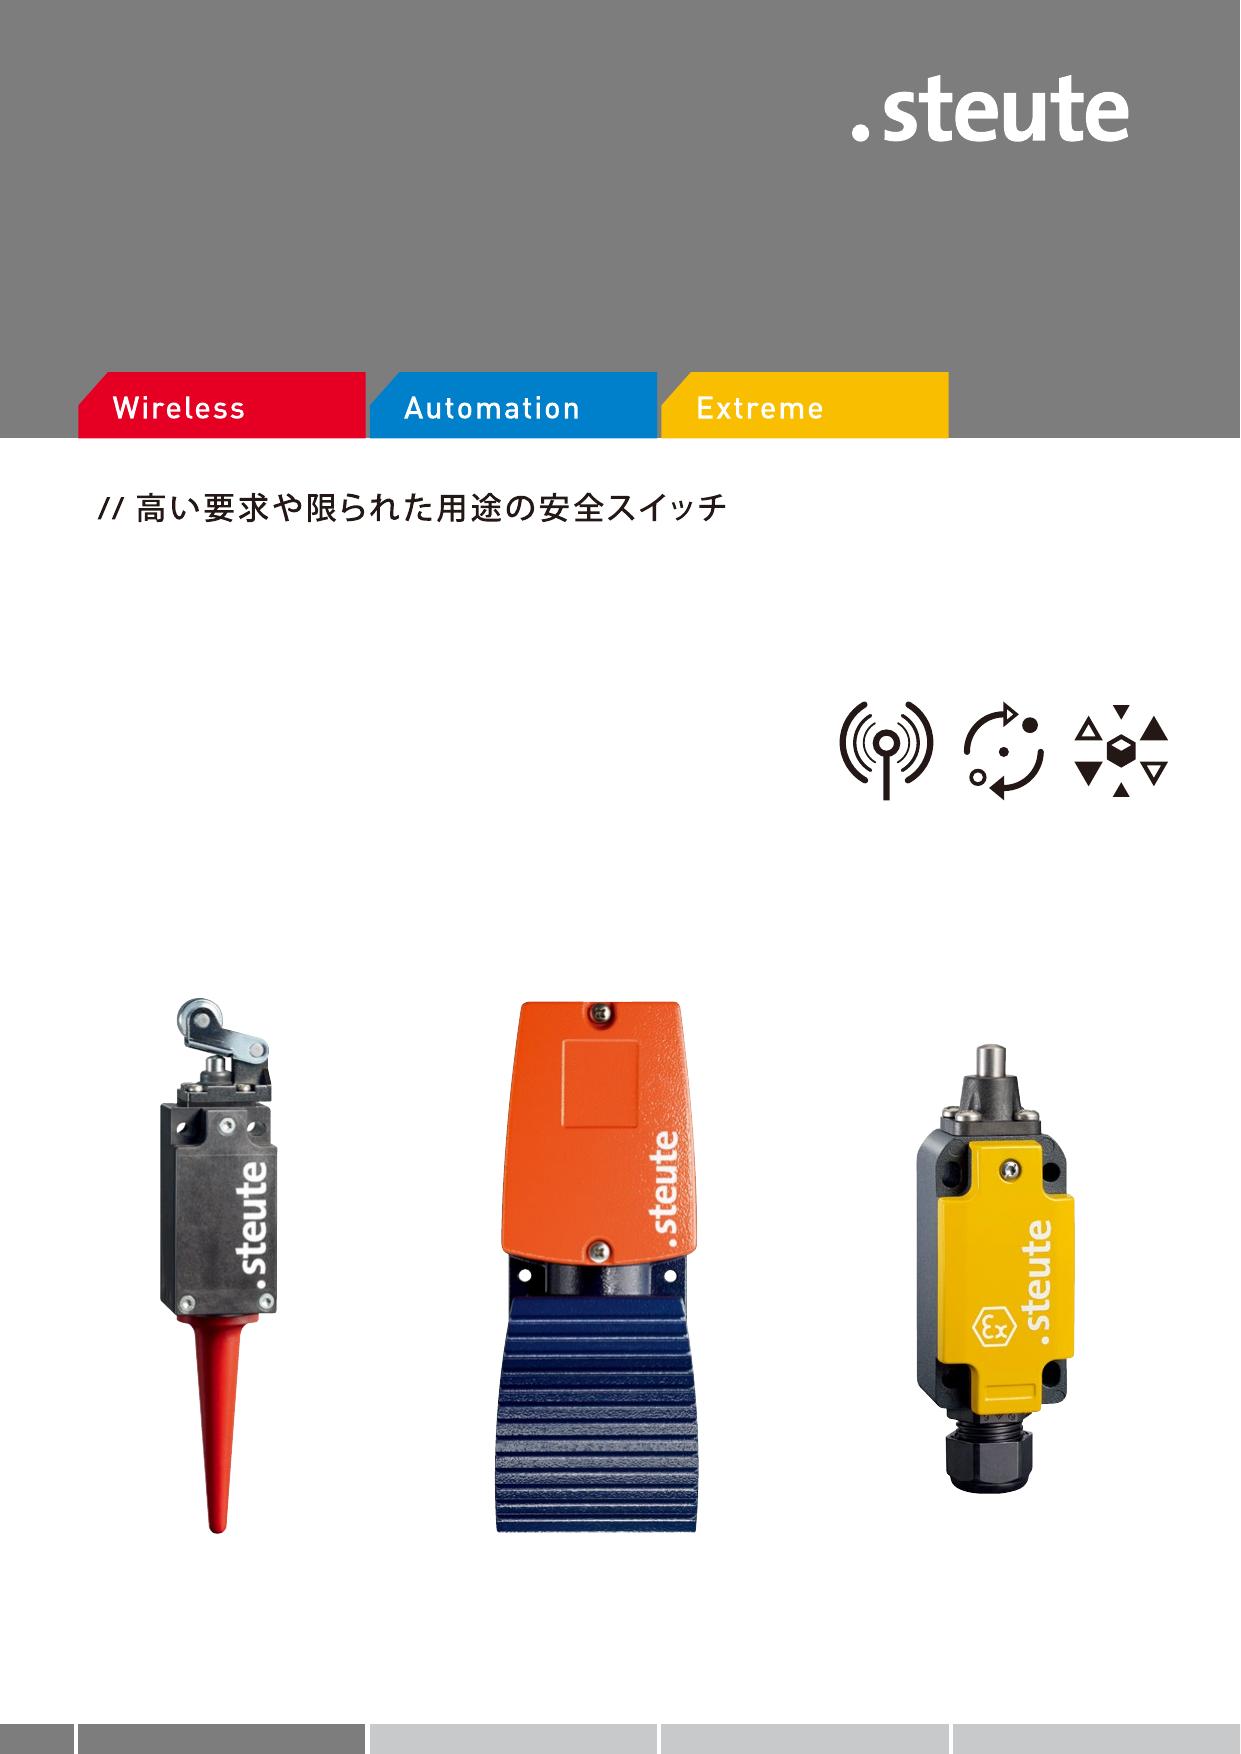 【総合案内】産業向け製品